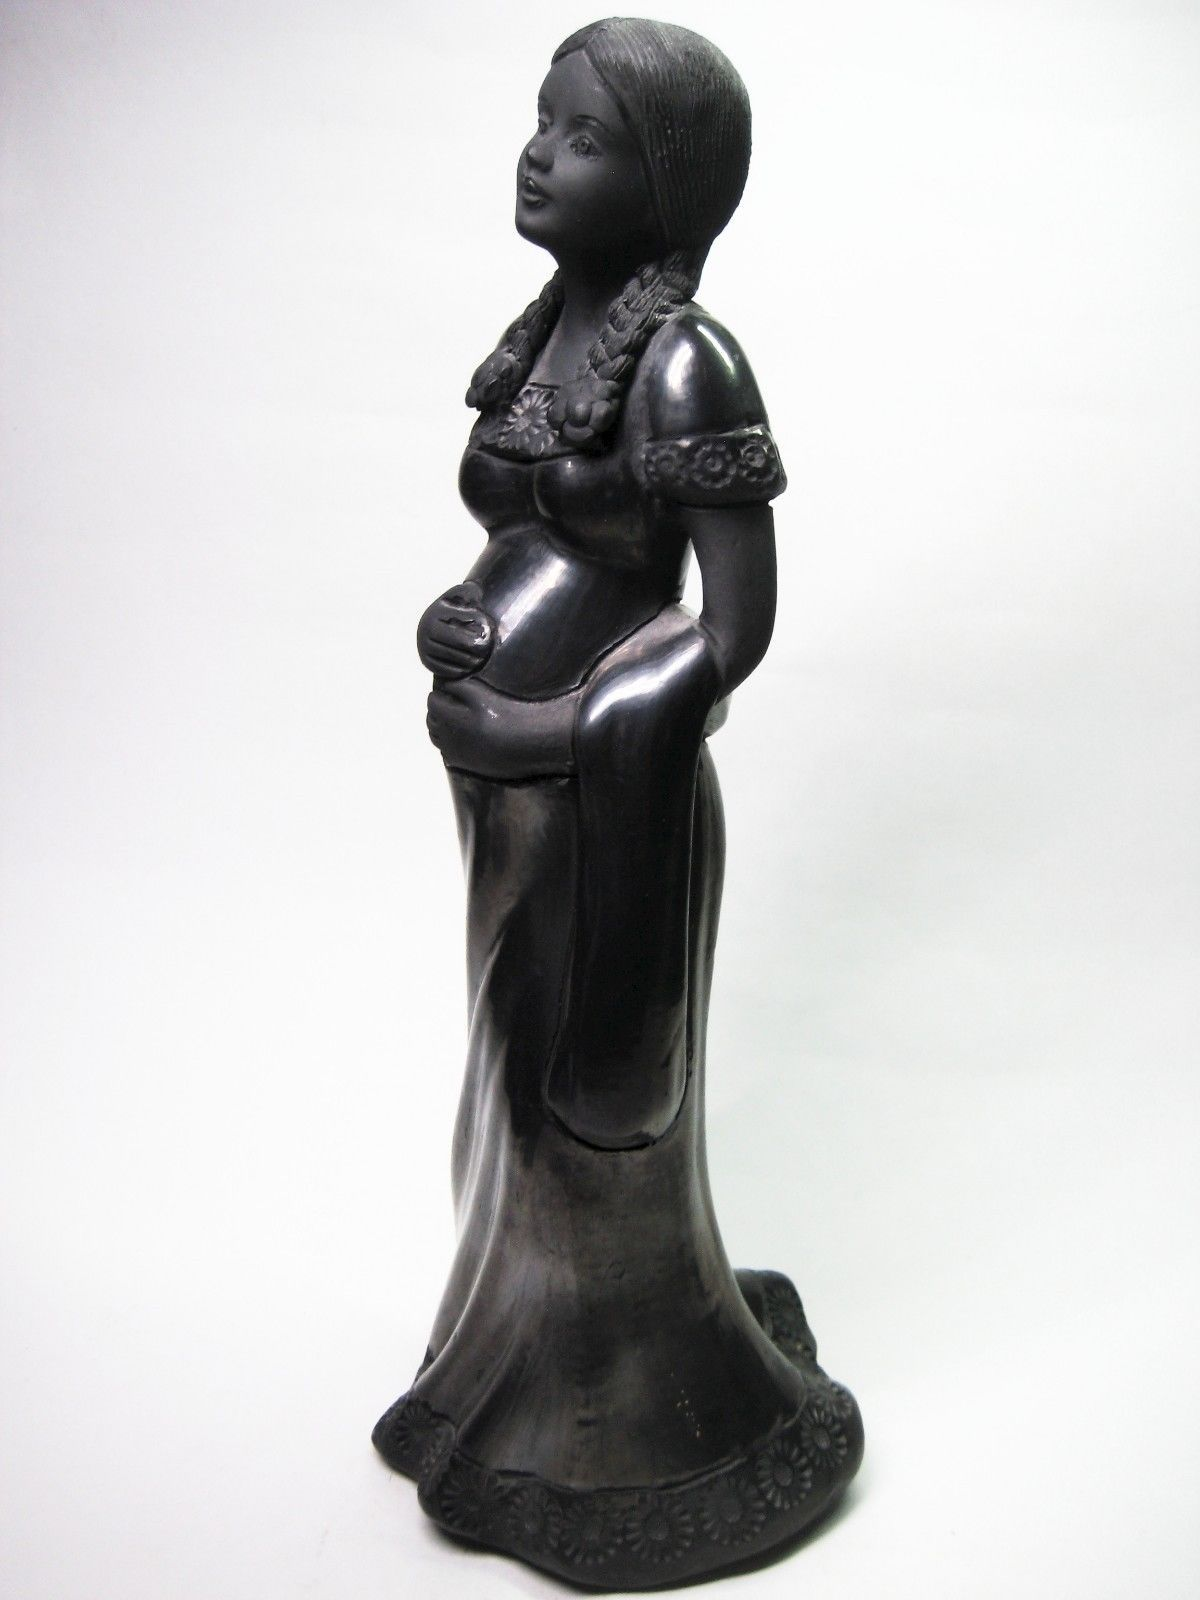 Mexican paper mache vintage judas sculpture folk art at 1stdibs - Mexican Folk Art Oaxaca Barro Negro Black Figure Statue Sculpture Woman Girl Ebay